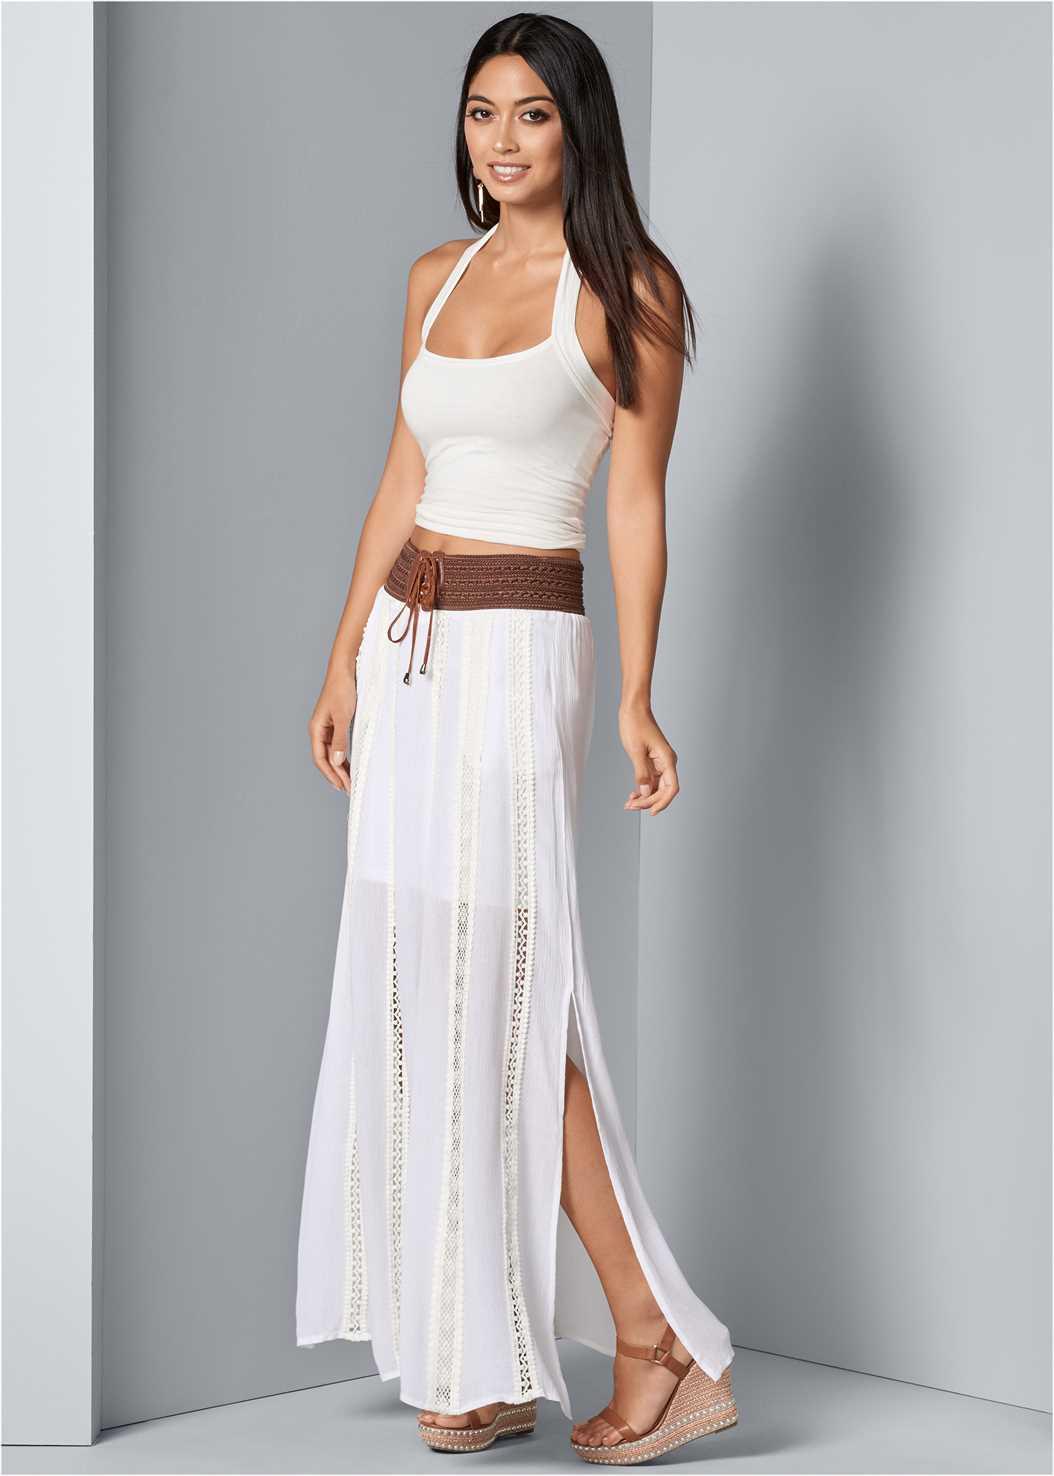 Lace Detail Maxi Skirt,Long Chain Pendant Necklace